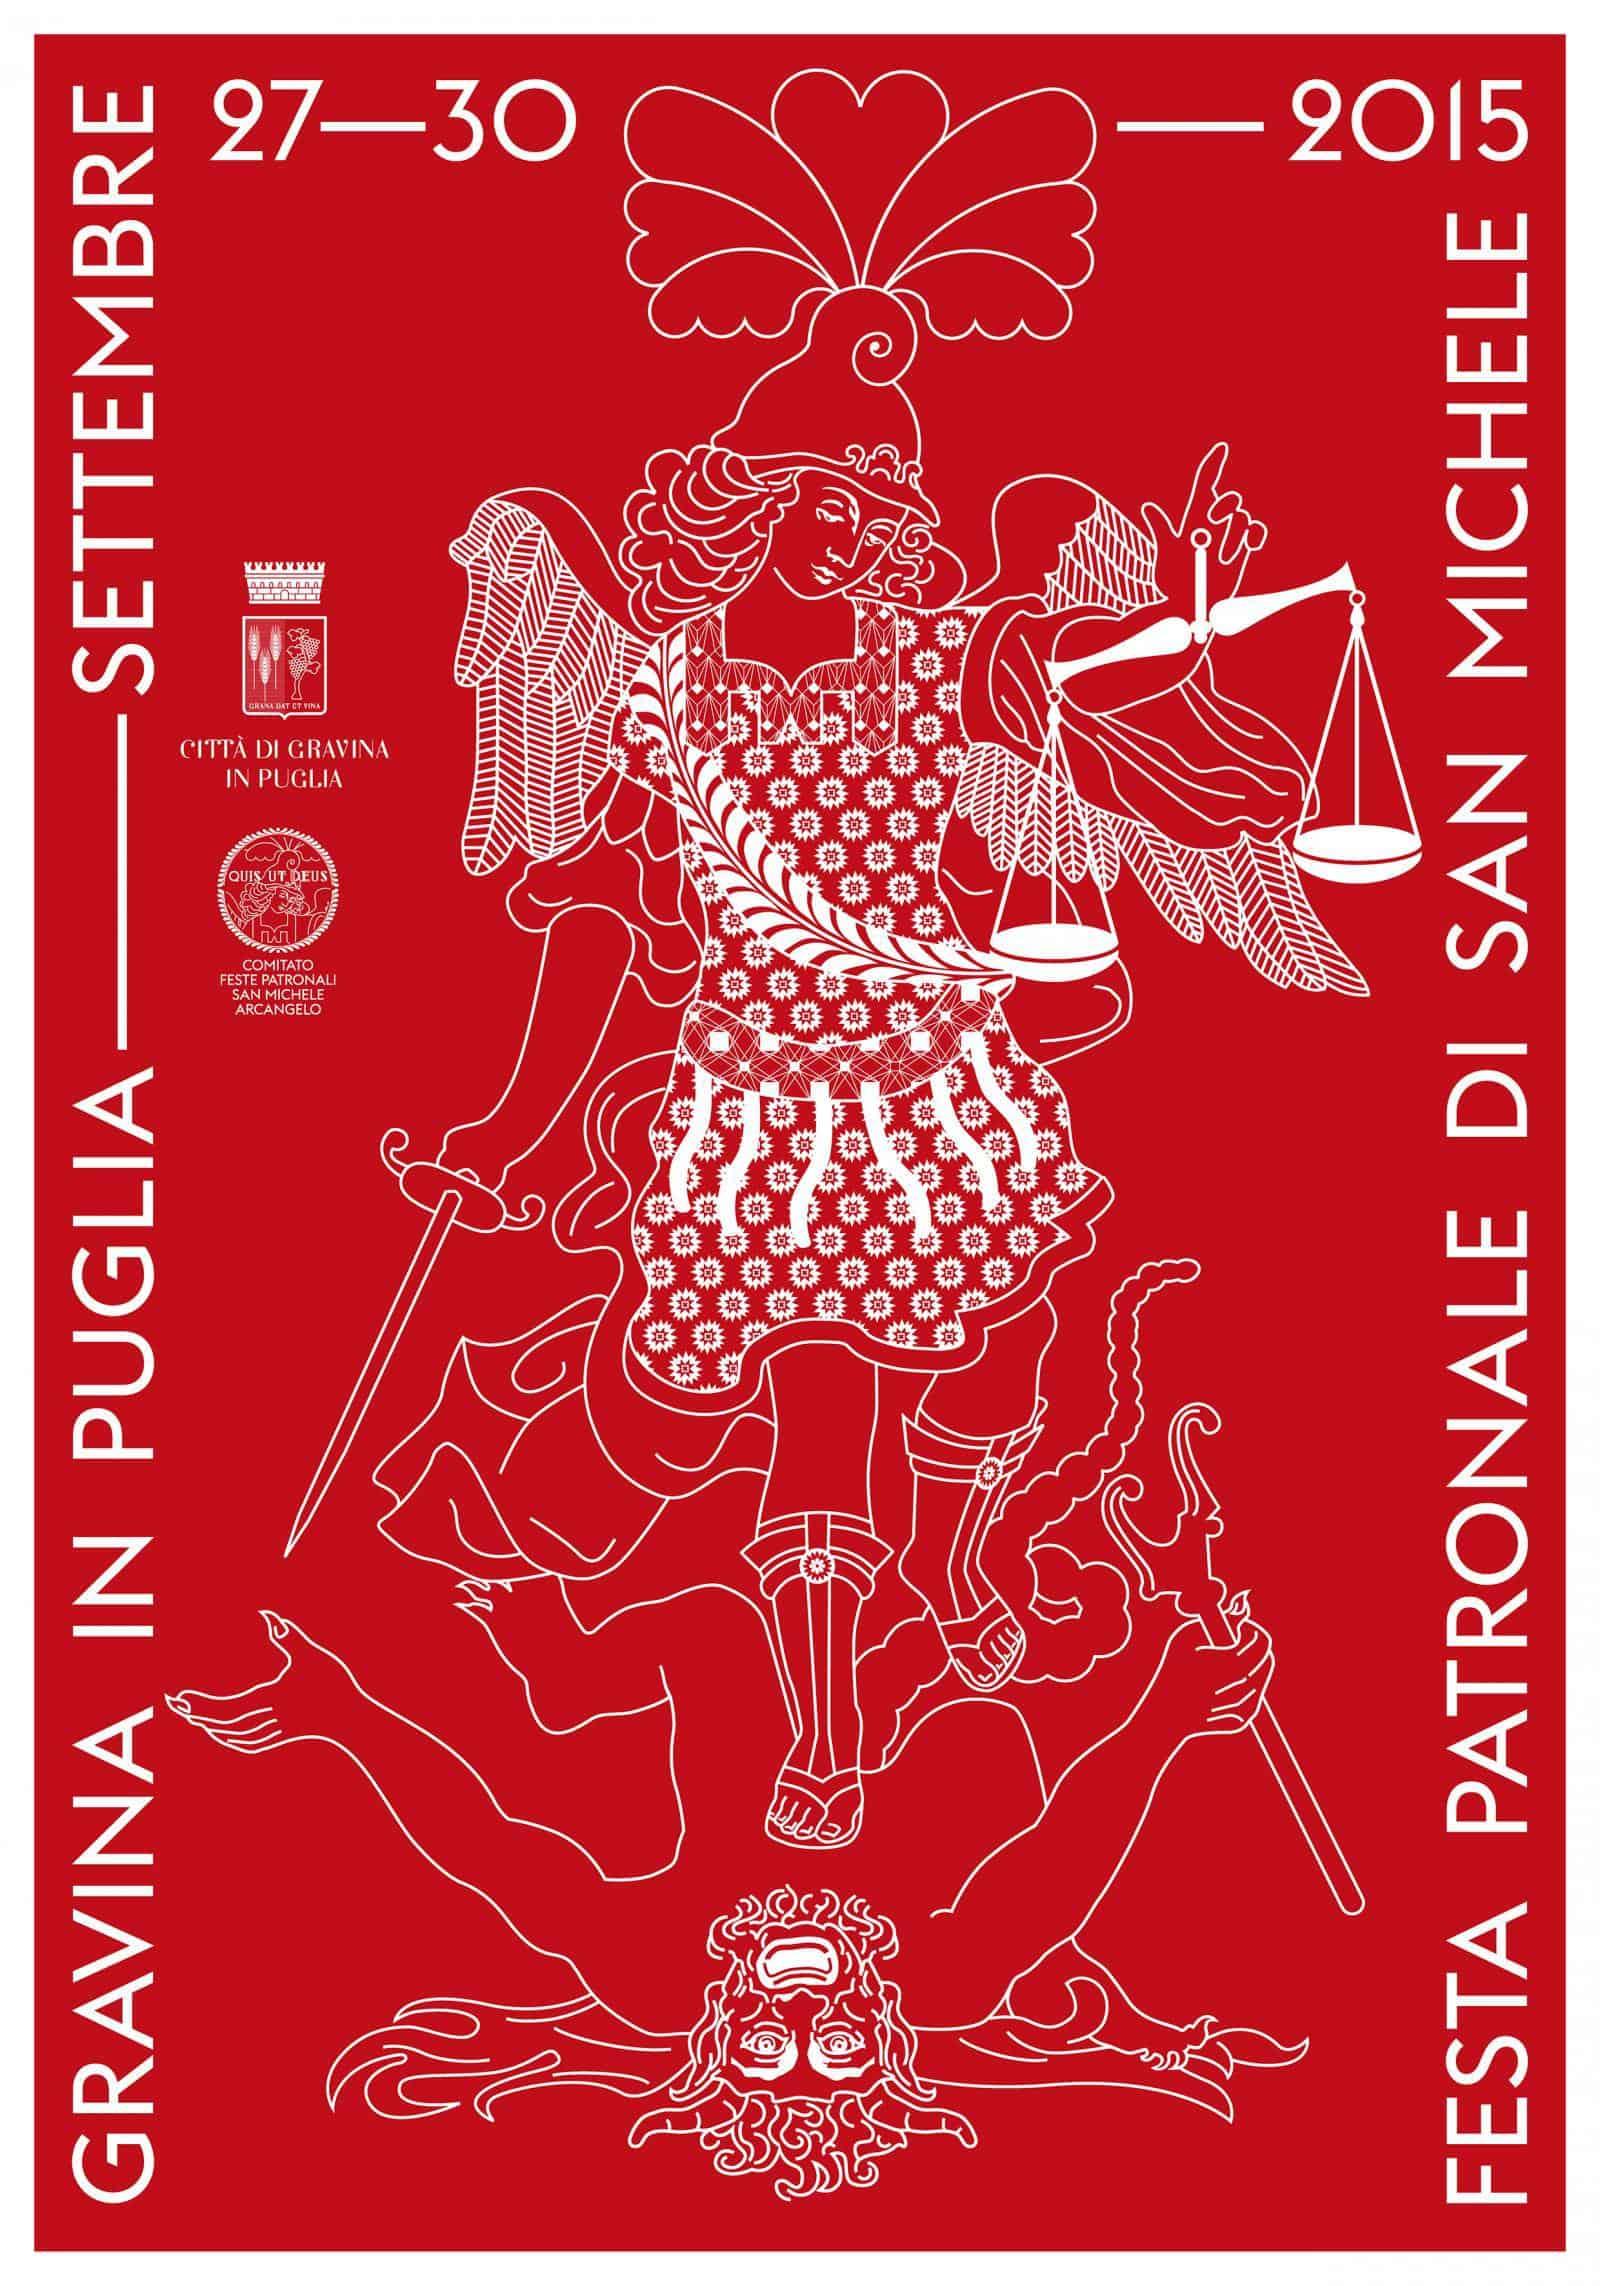 Graphic Design | Poster for the Saint Michael Patronal festival – AGI